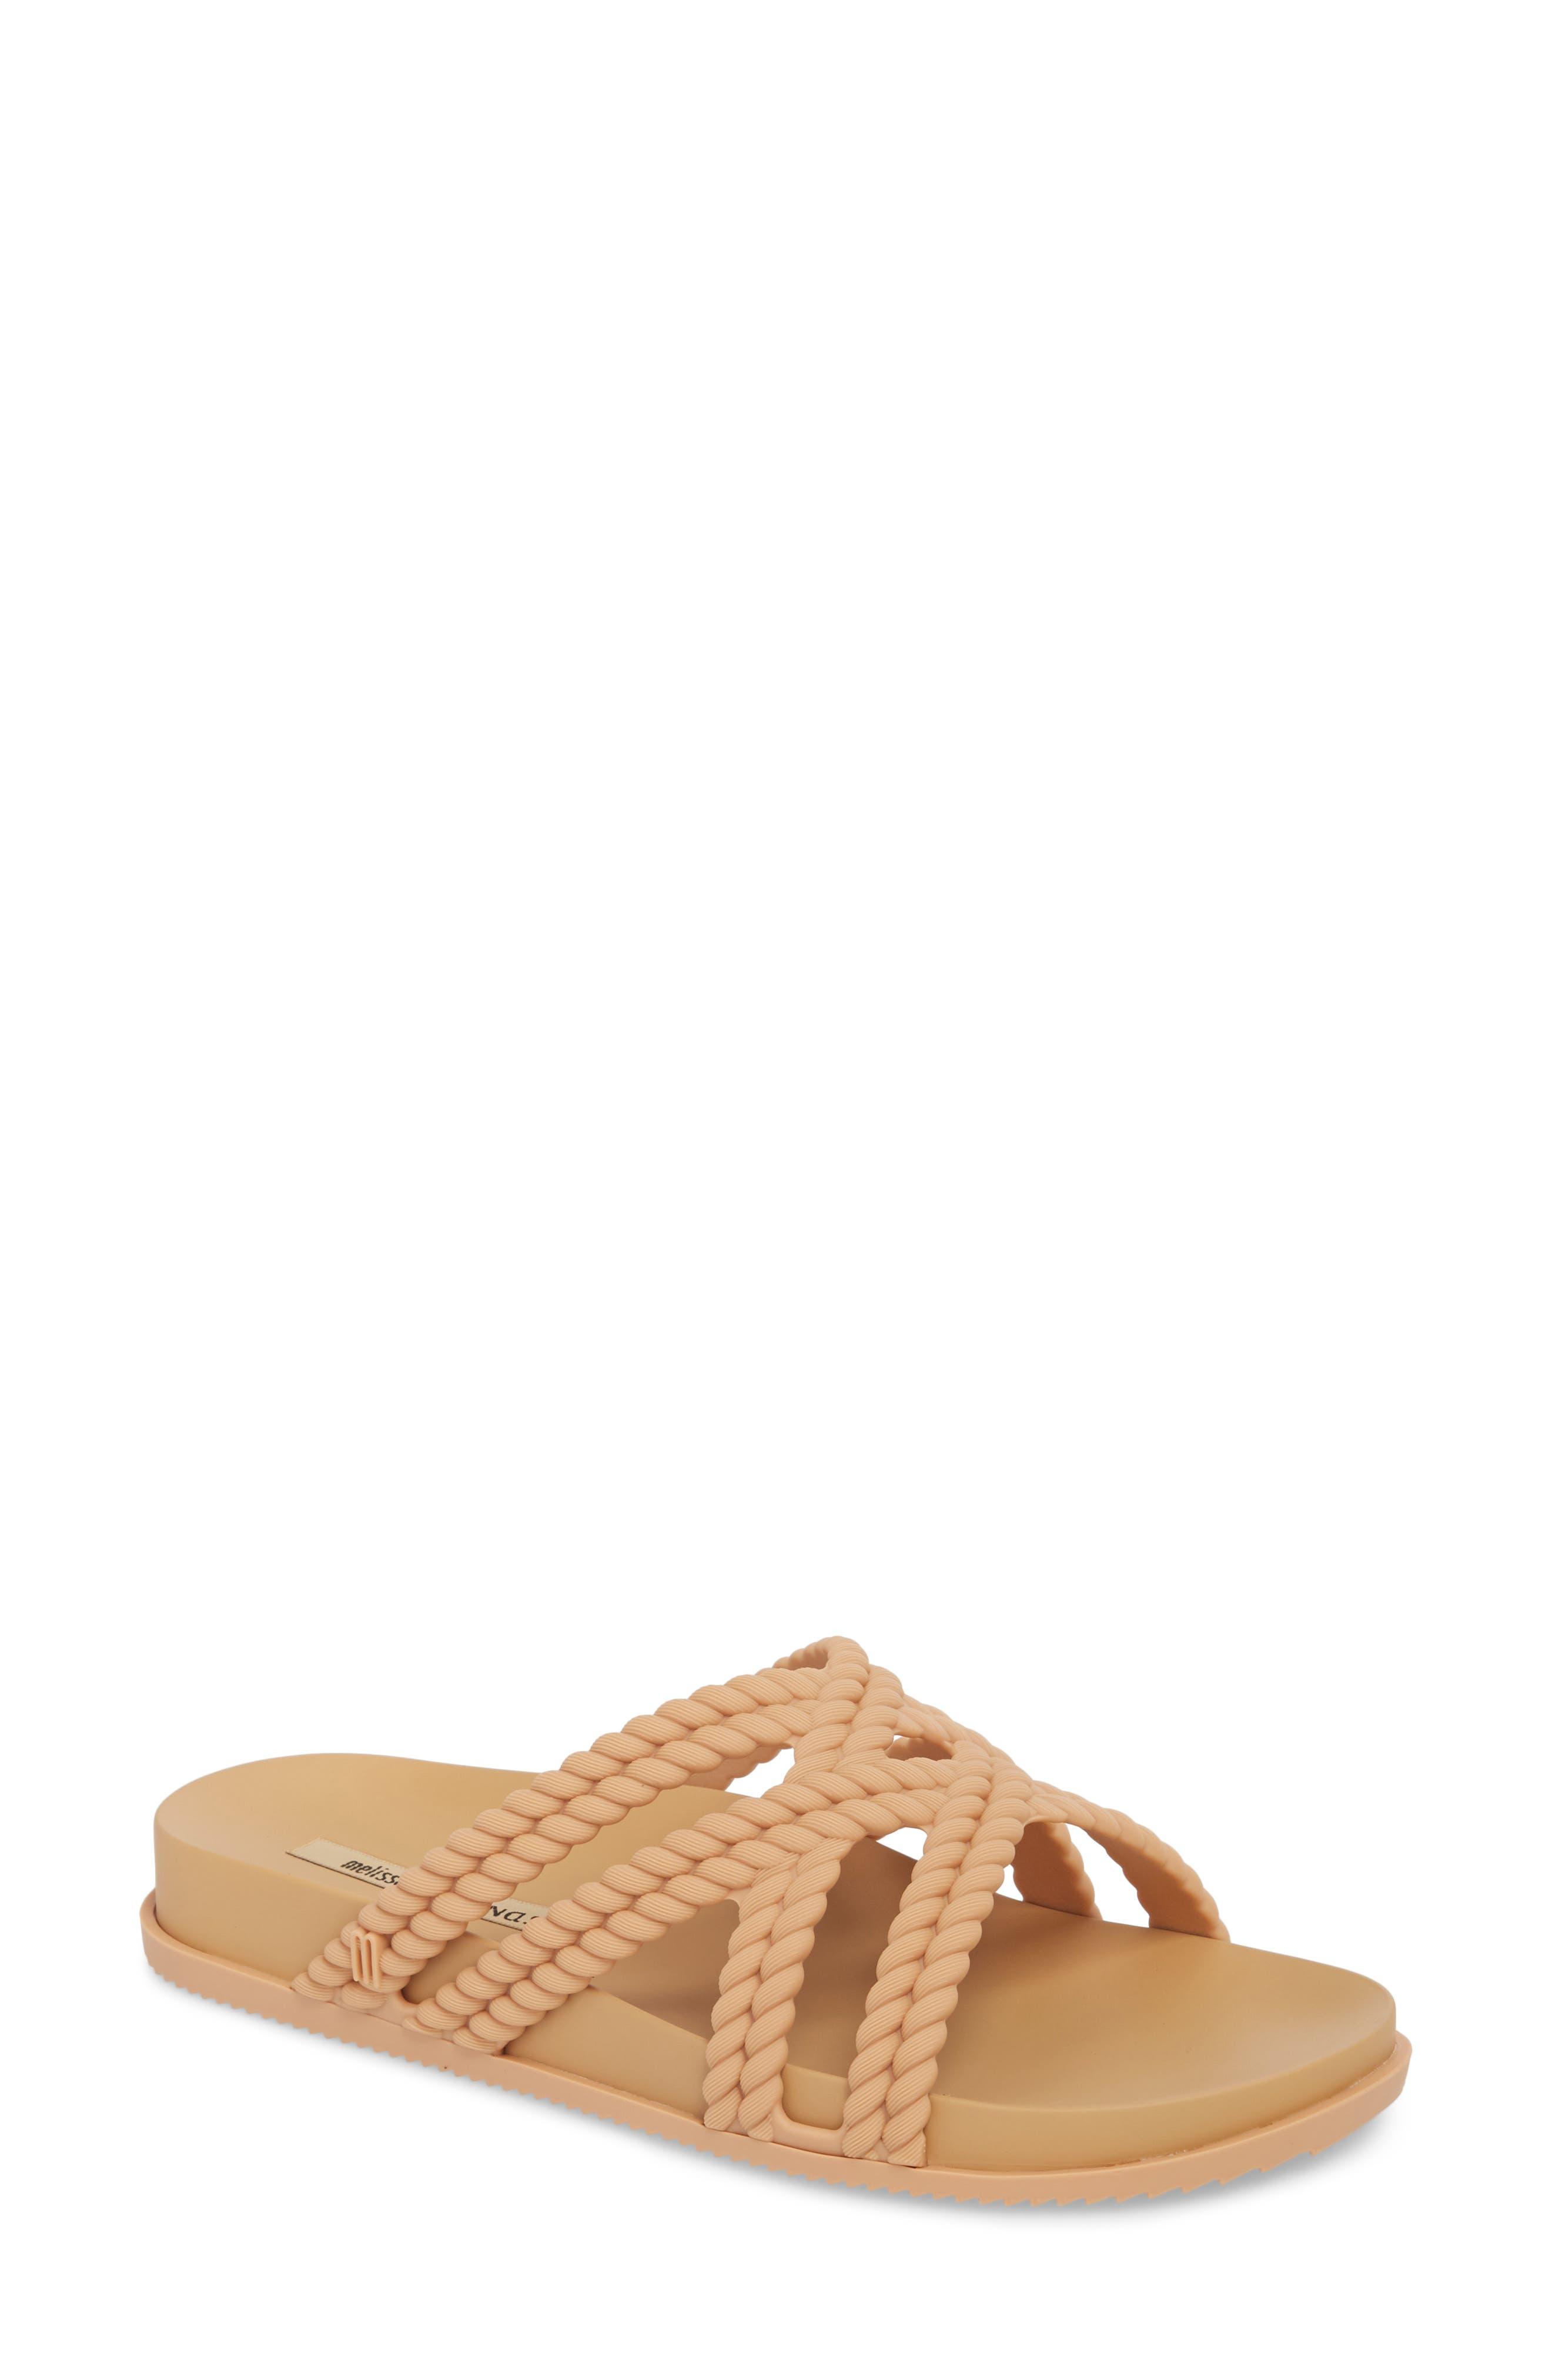 Cosmic Salinas Slide Sandal,                         Main,                         color, Light Brown